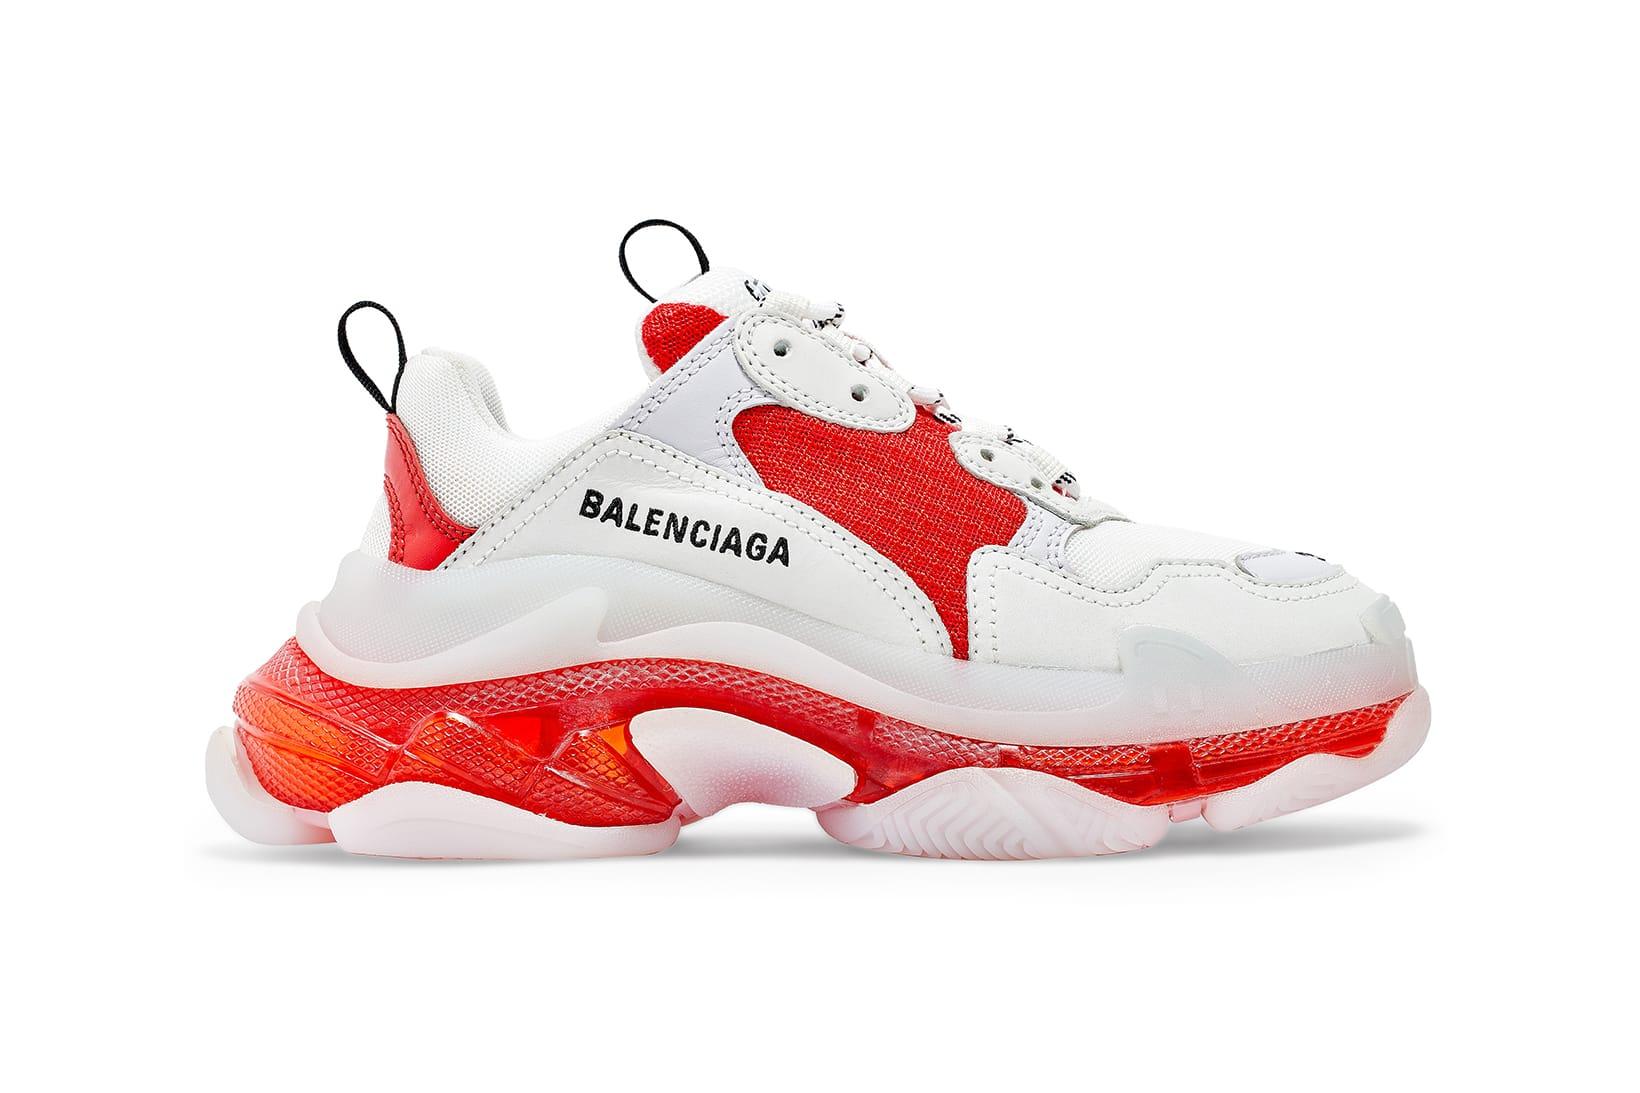 Best UA Gucci Balenciaga Triple S Sneakers Sale at Cheap